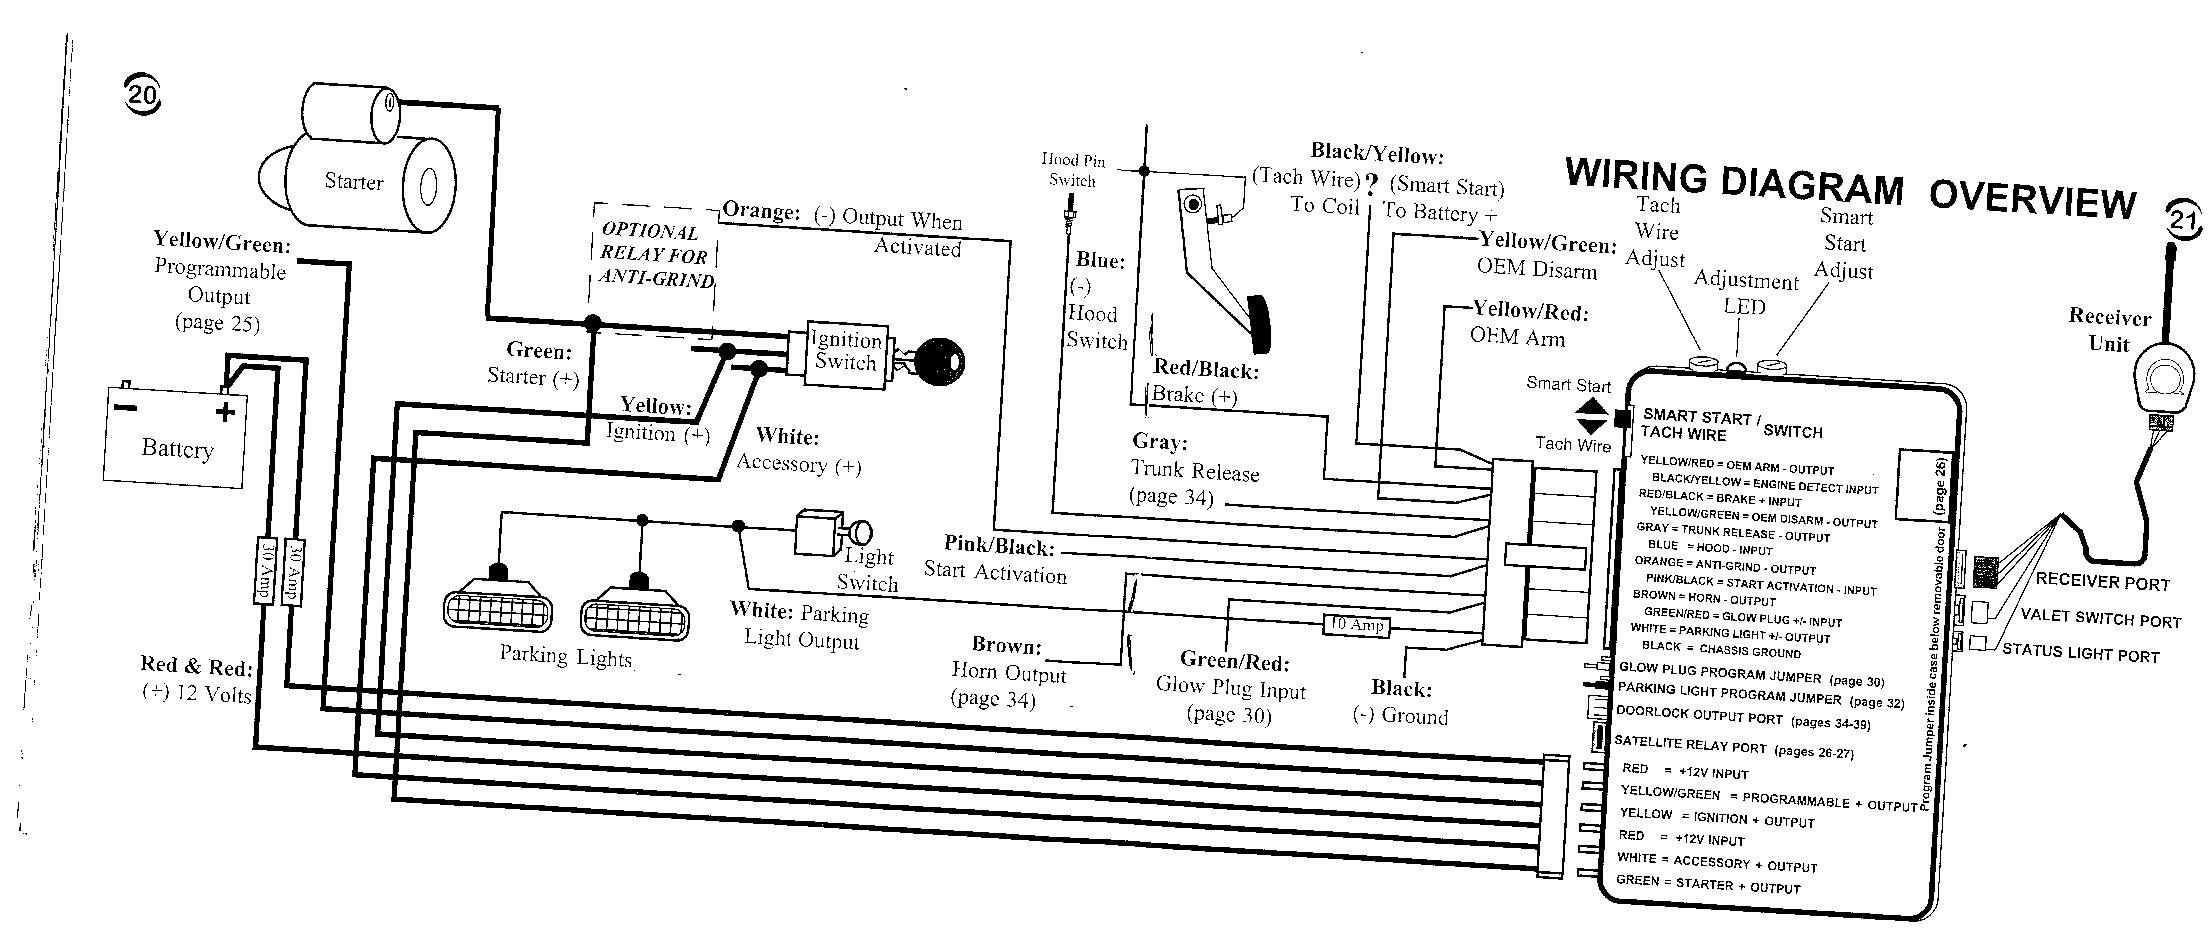 Viper 5701 Wiring Diagram 2008 Subaru | Wiring Diagram - Viper 5305V Wiring Diagram